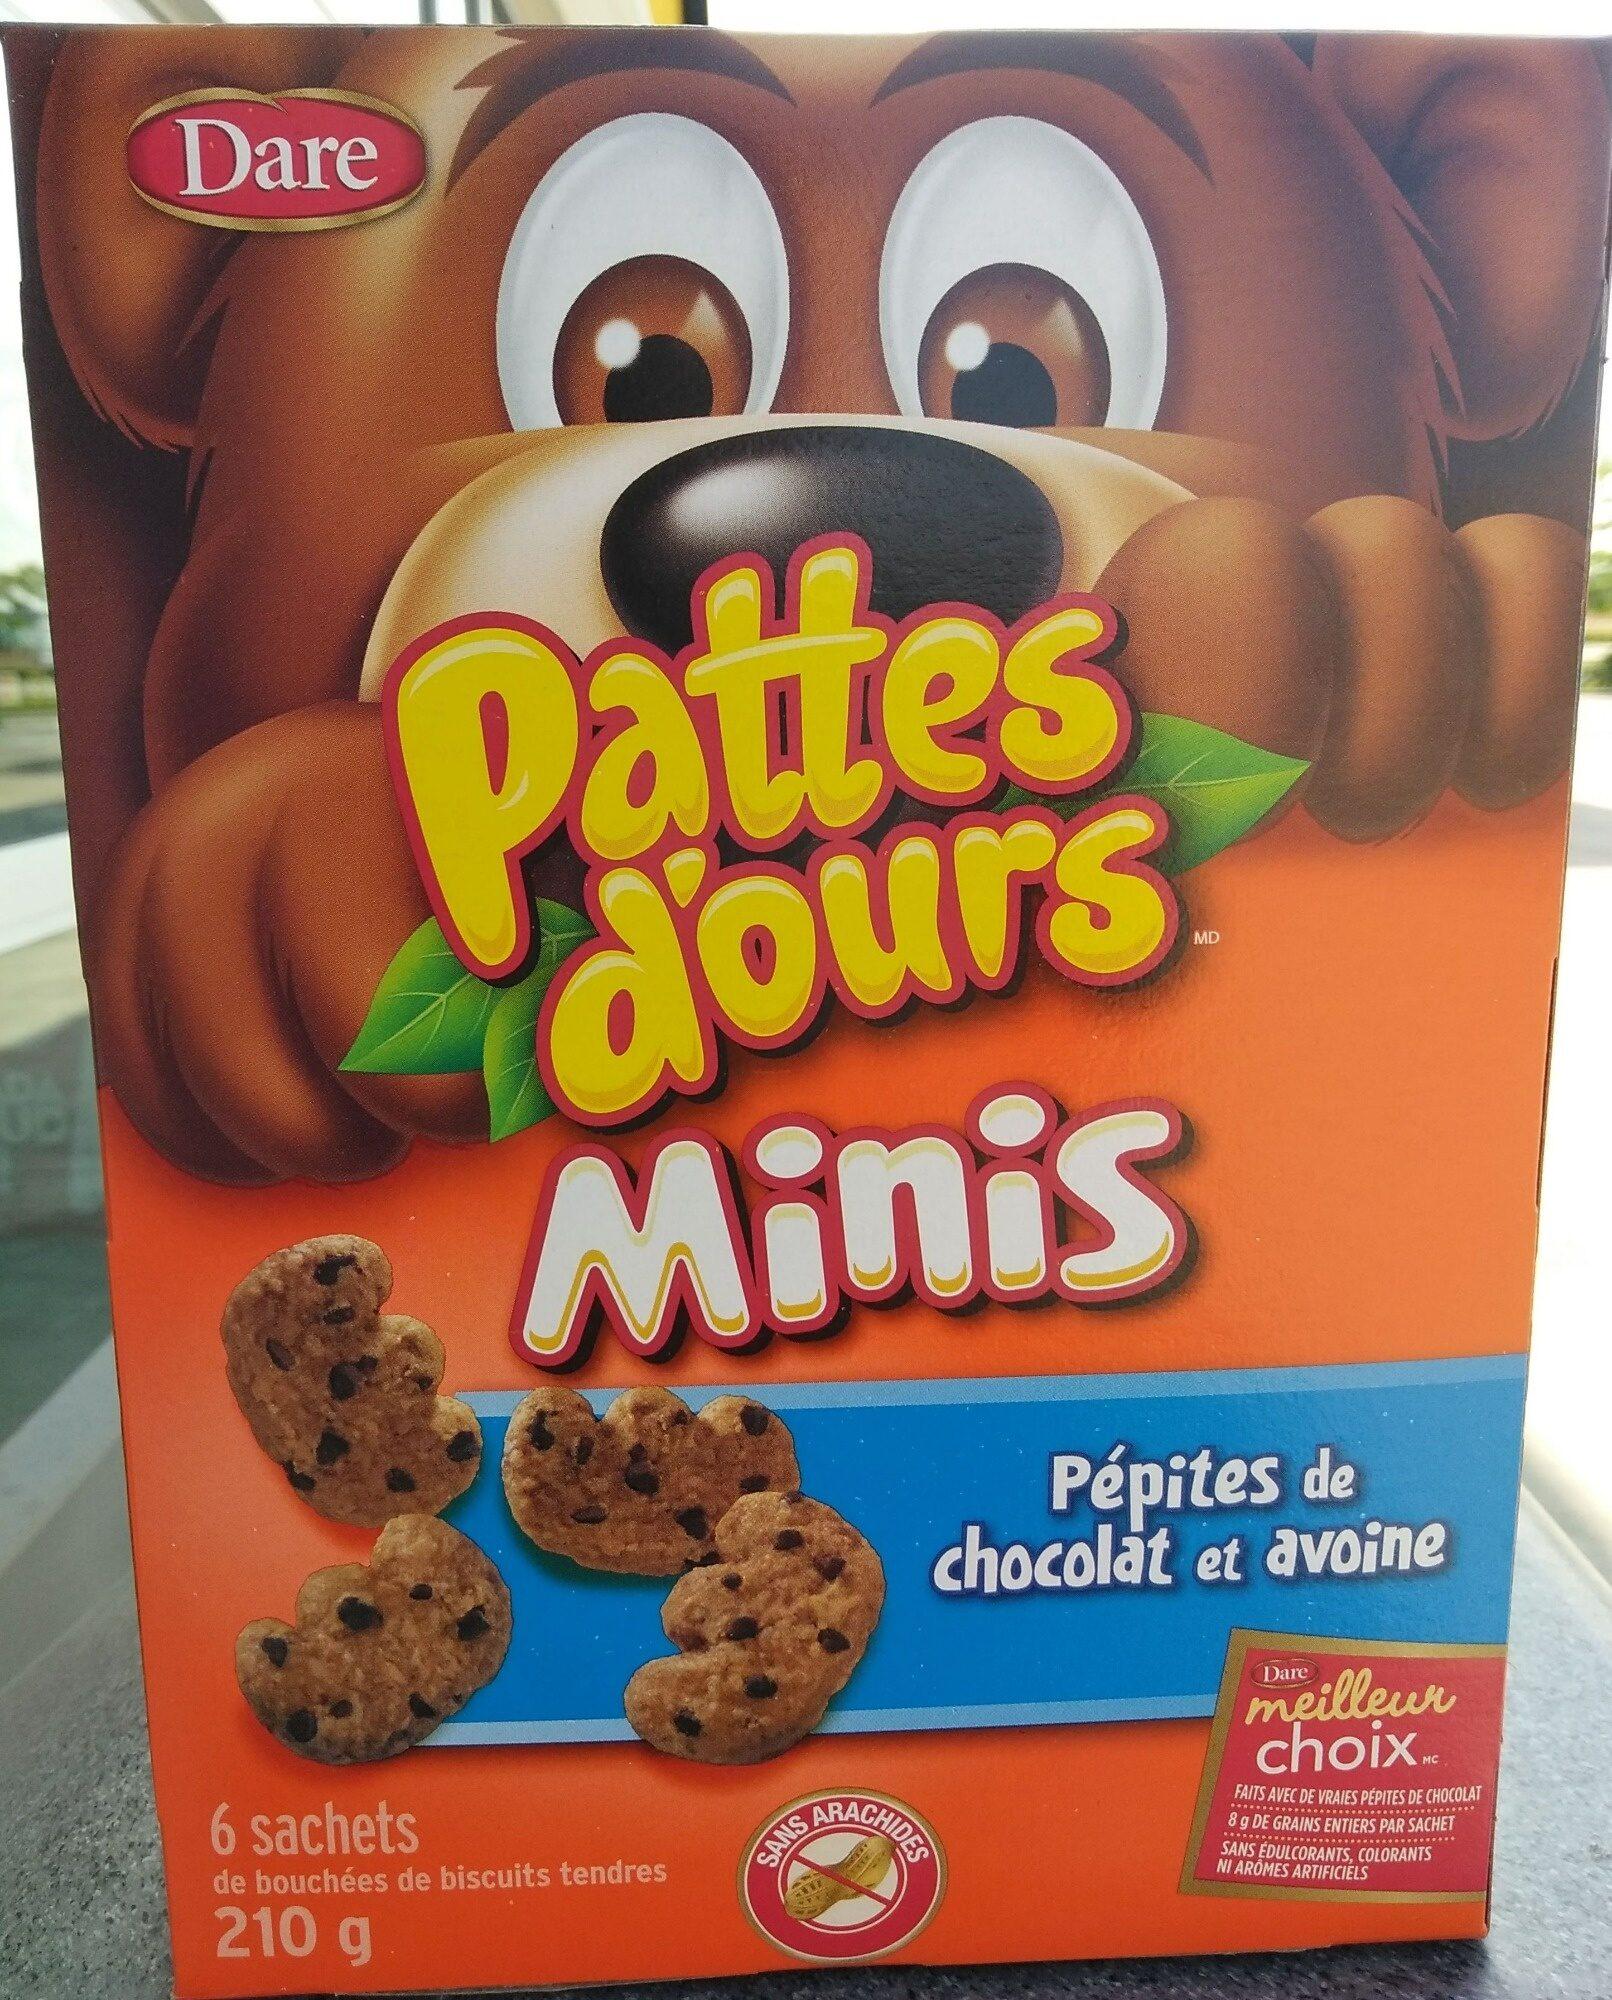 Bear Paws Minis Soft Bite-Sized Oatmeal Chocolate Chip Cookies - Produit - fr